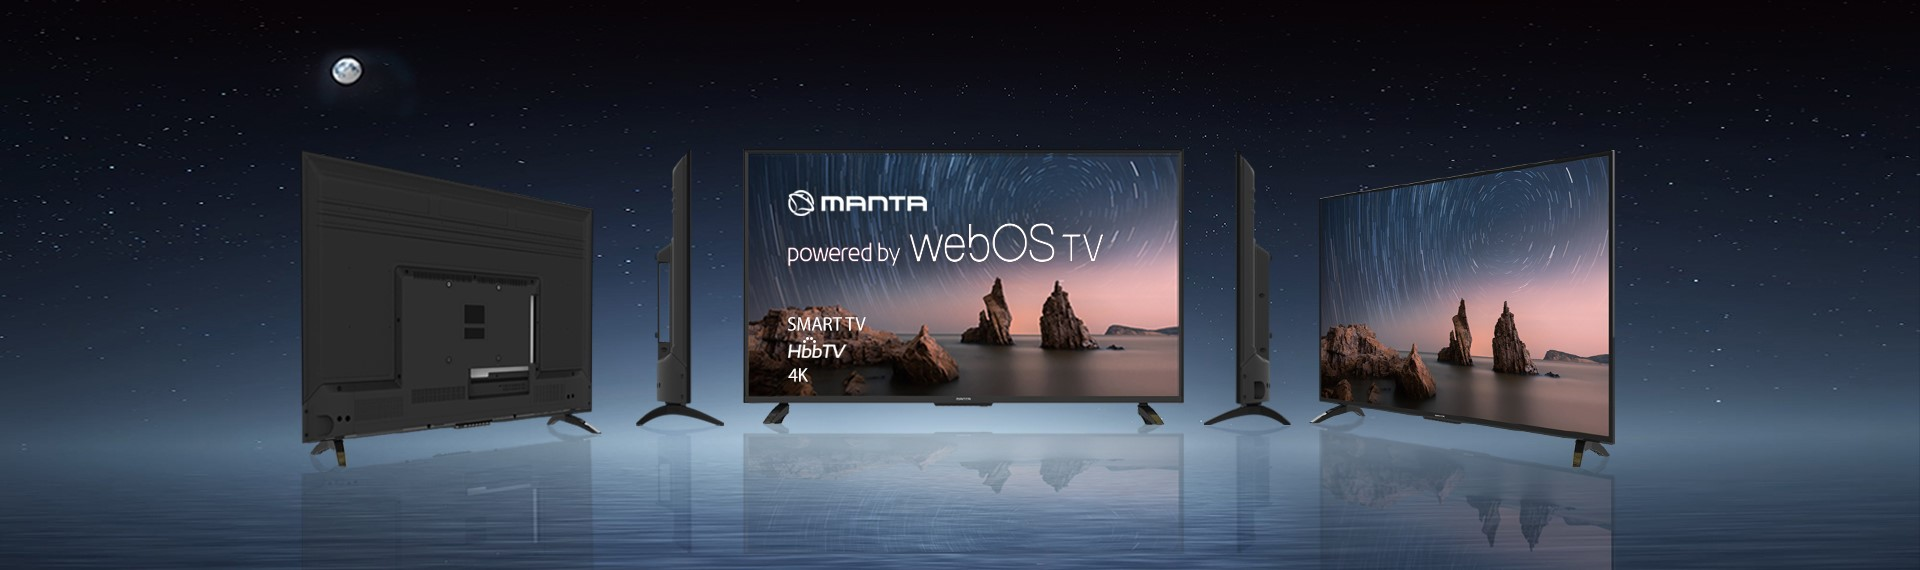 Manta WebOS TV model 43LUW121D DVB-T2/HEVC HbbTV